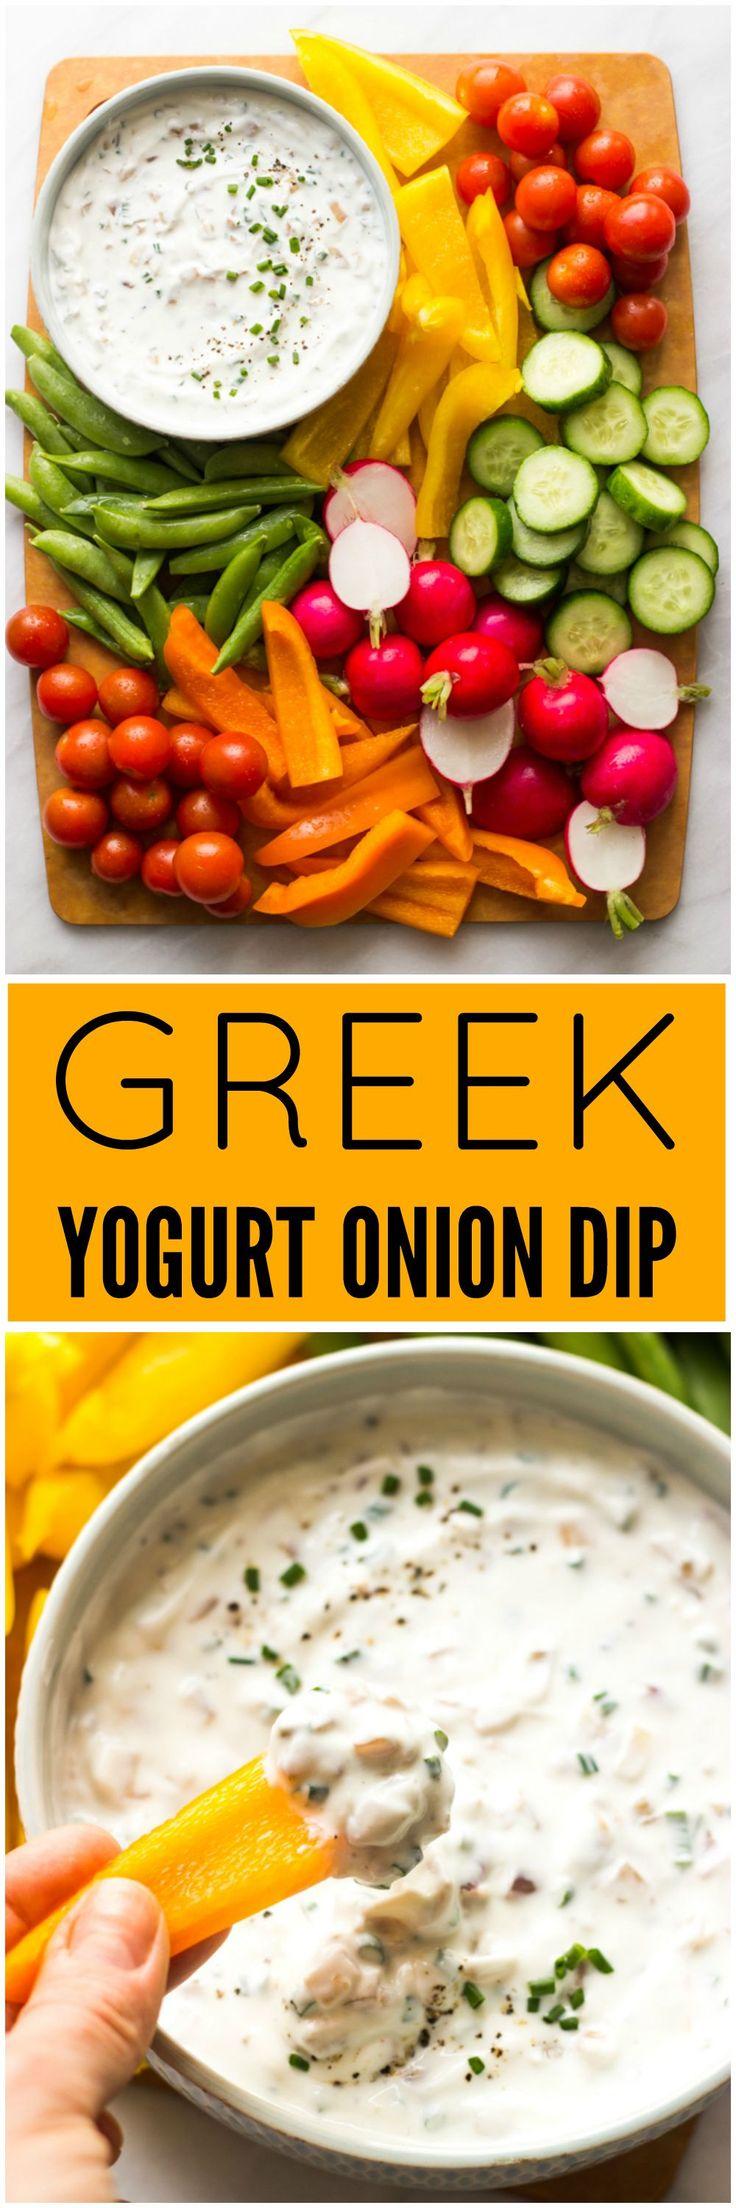 Greek Yogurt Onion Dip - healthy onion dip made with Greek yogurt, caramelized shallots, and chives. Only 66 cal per serving! | littlebroken.com @littlebroken